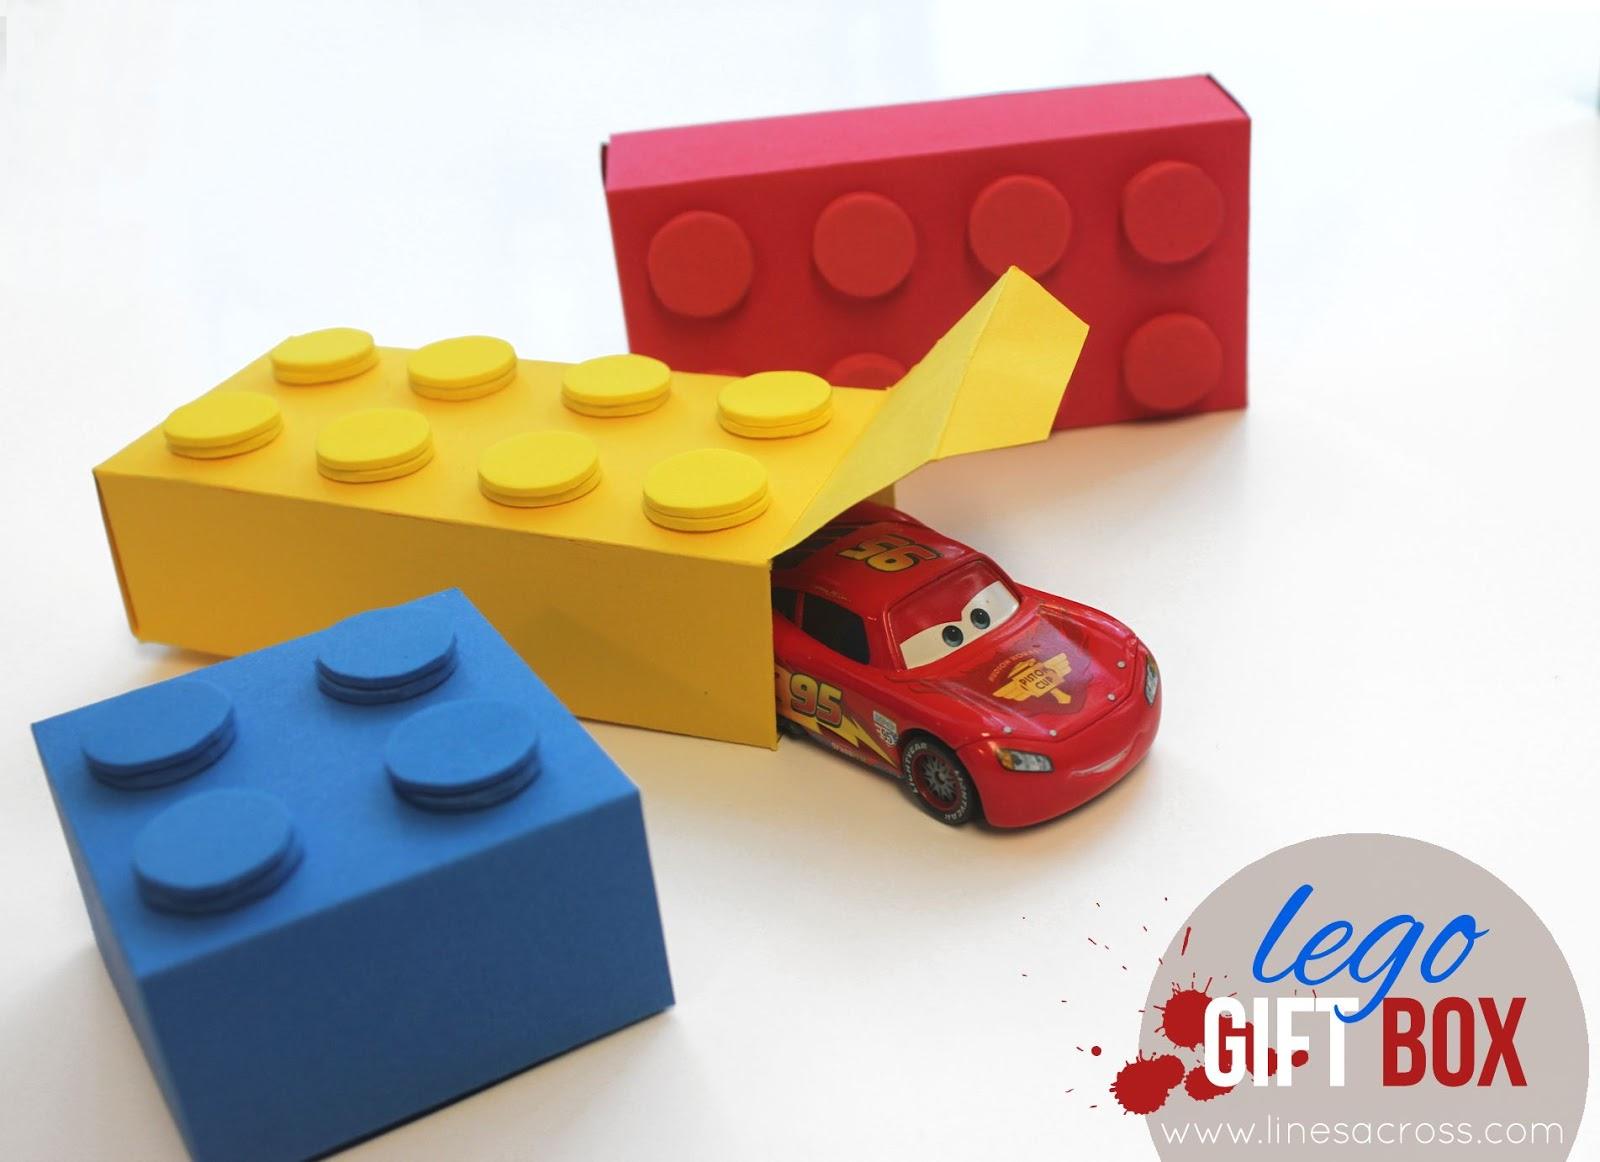 Lego Gift Box